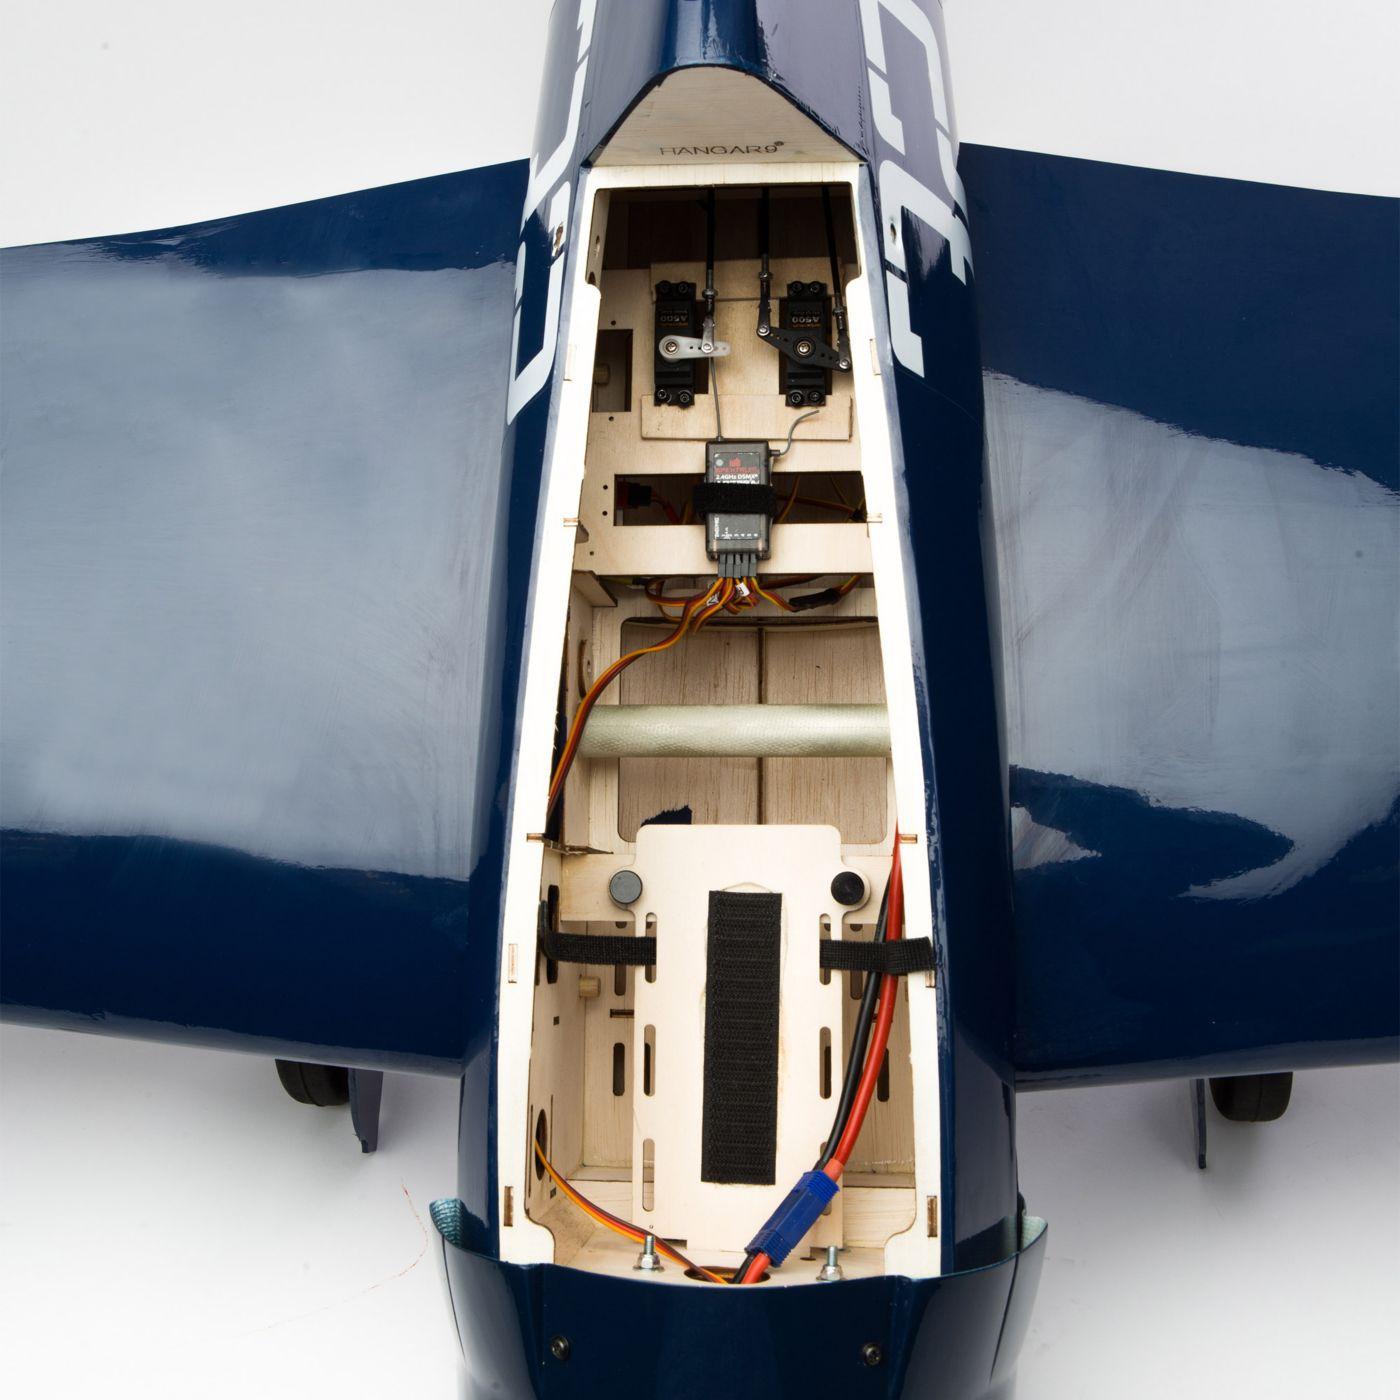 Hangar 9 F6F Hellcat 15cc Sport Scale ARF